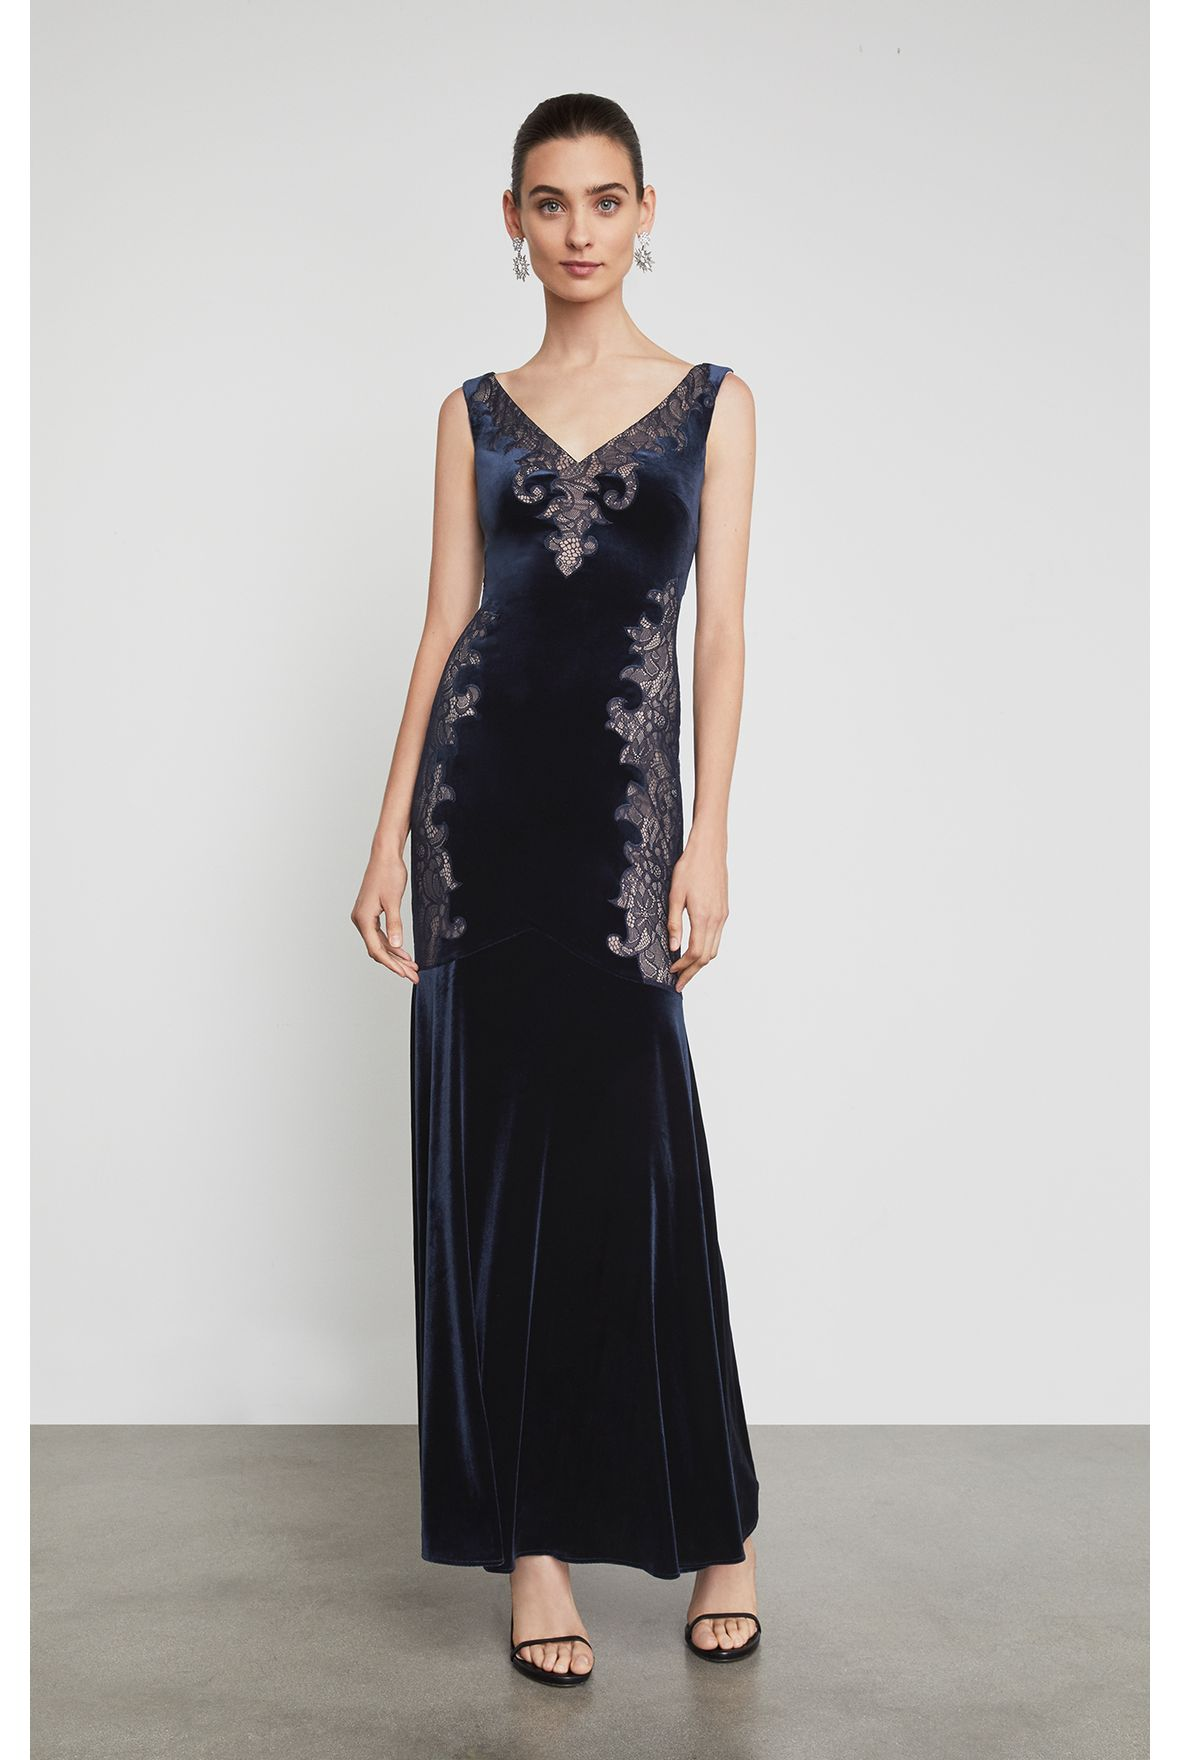 Vestido-largo-de-velvet-GFH6170256_411_b